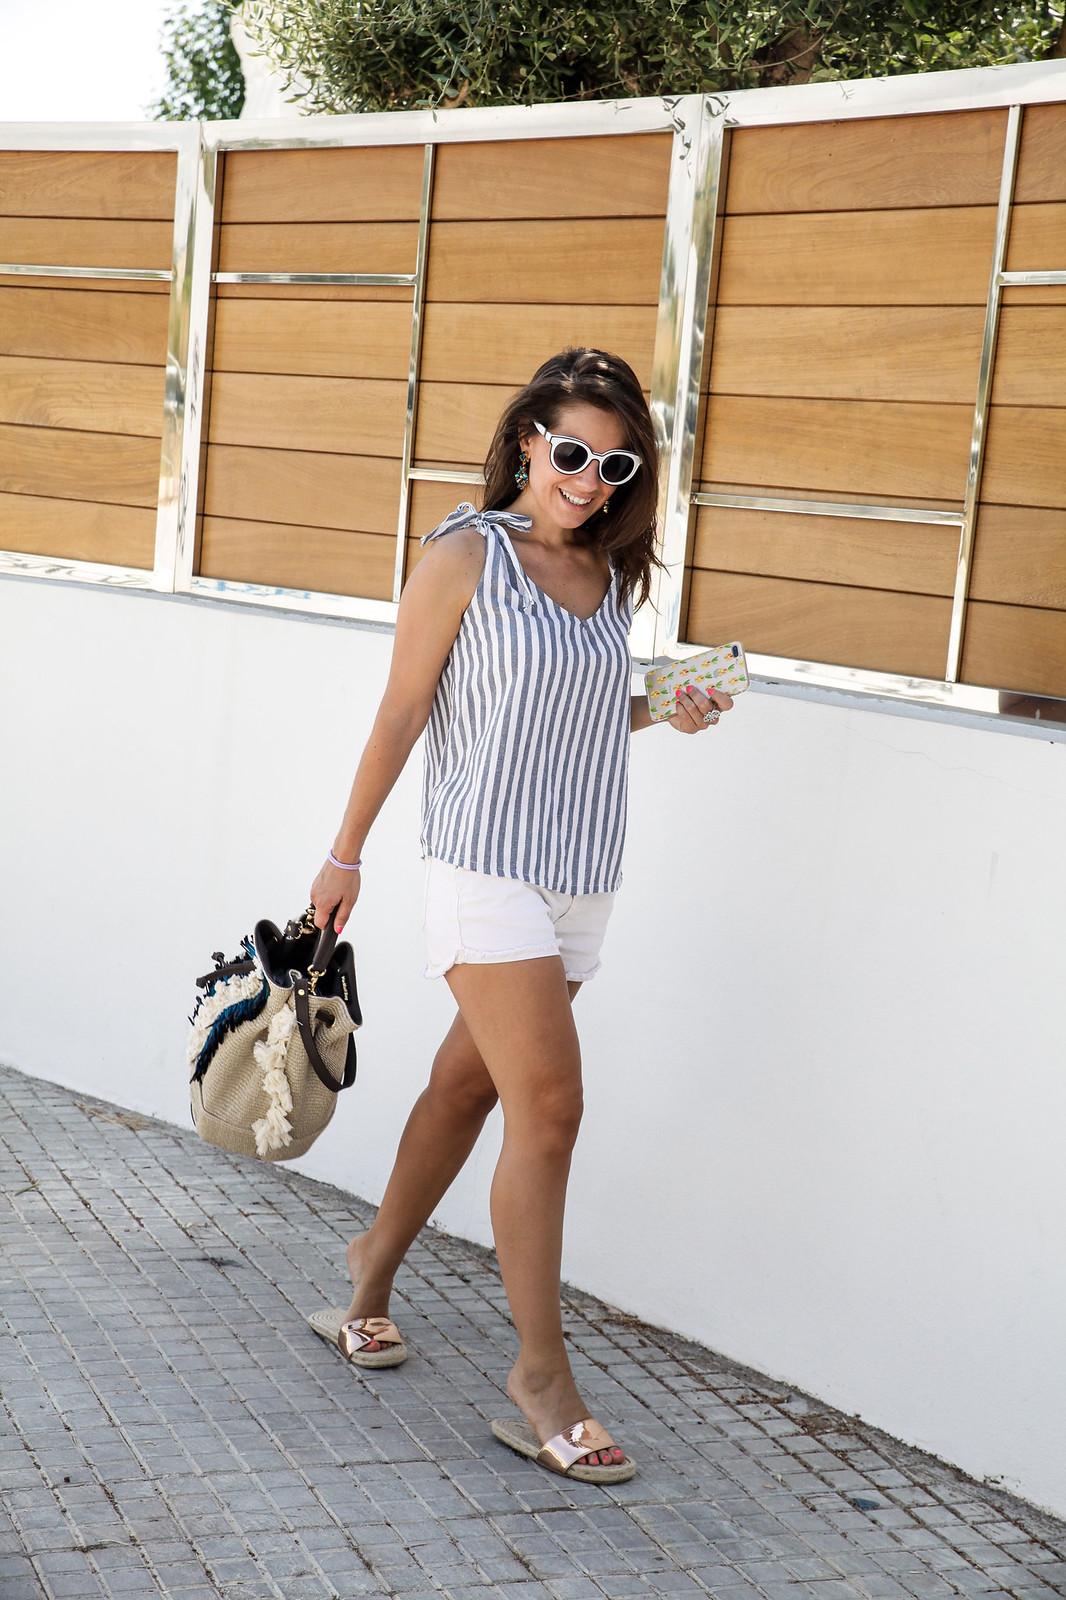 010_como_combinar_un_top_de_rayas_nuevo_bolso_boho_theguestgirl_influencer_spain_barcelona_viamailbag_boho_fringed_bag